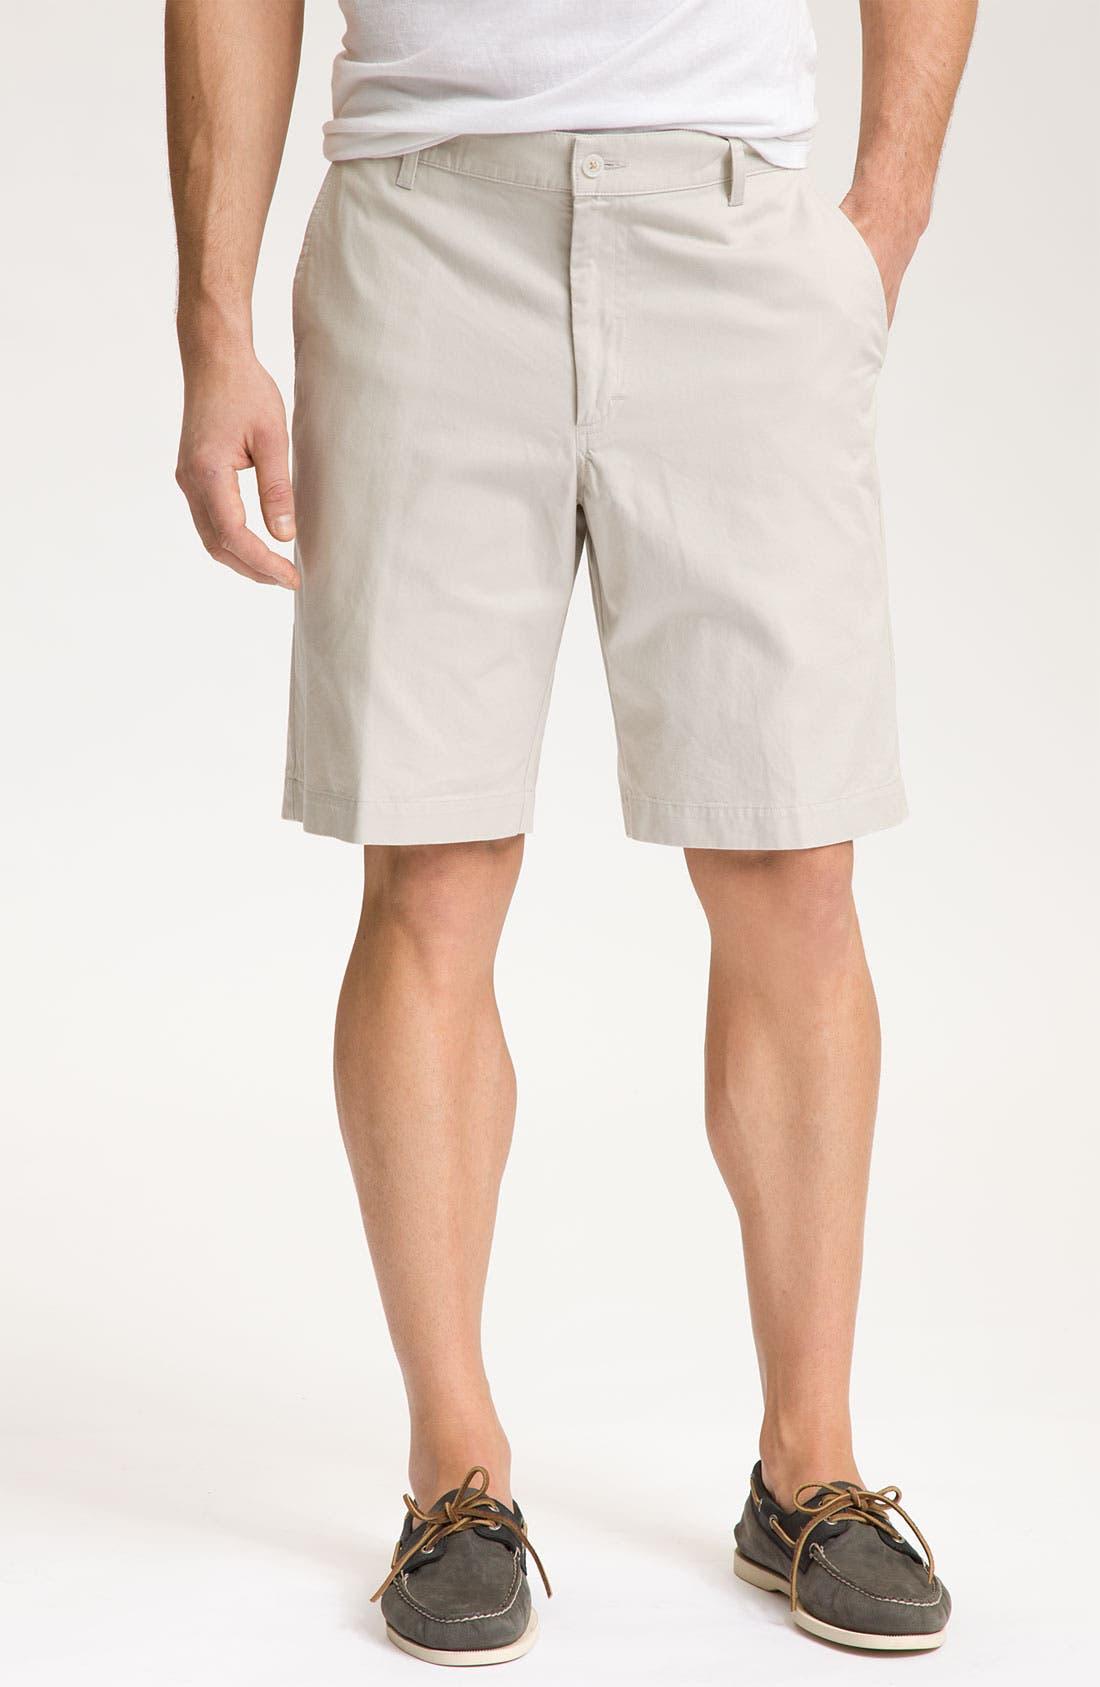 Alternate Image 1 Selected - Bill's Khakis 'Parker' Flat Front Shorts